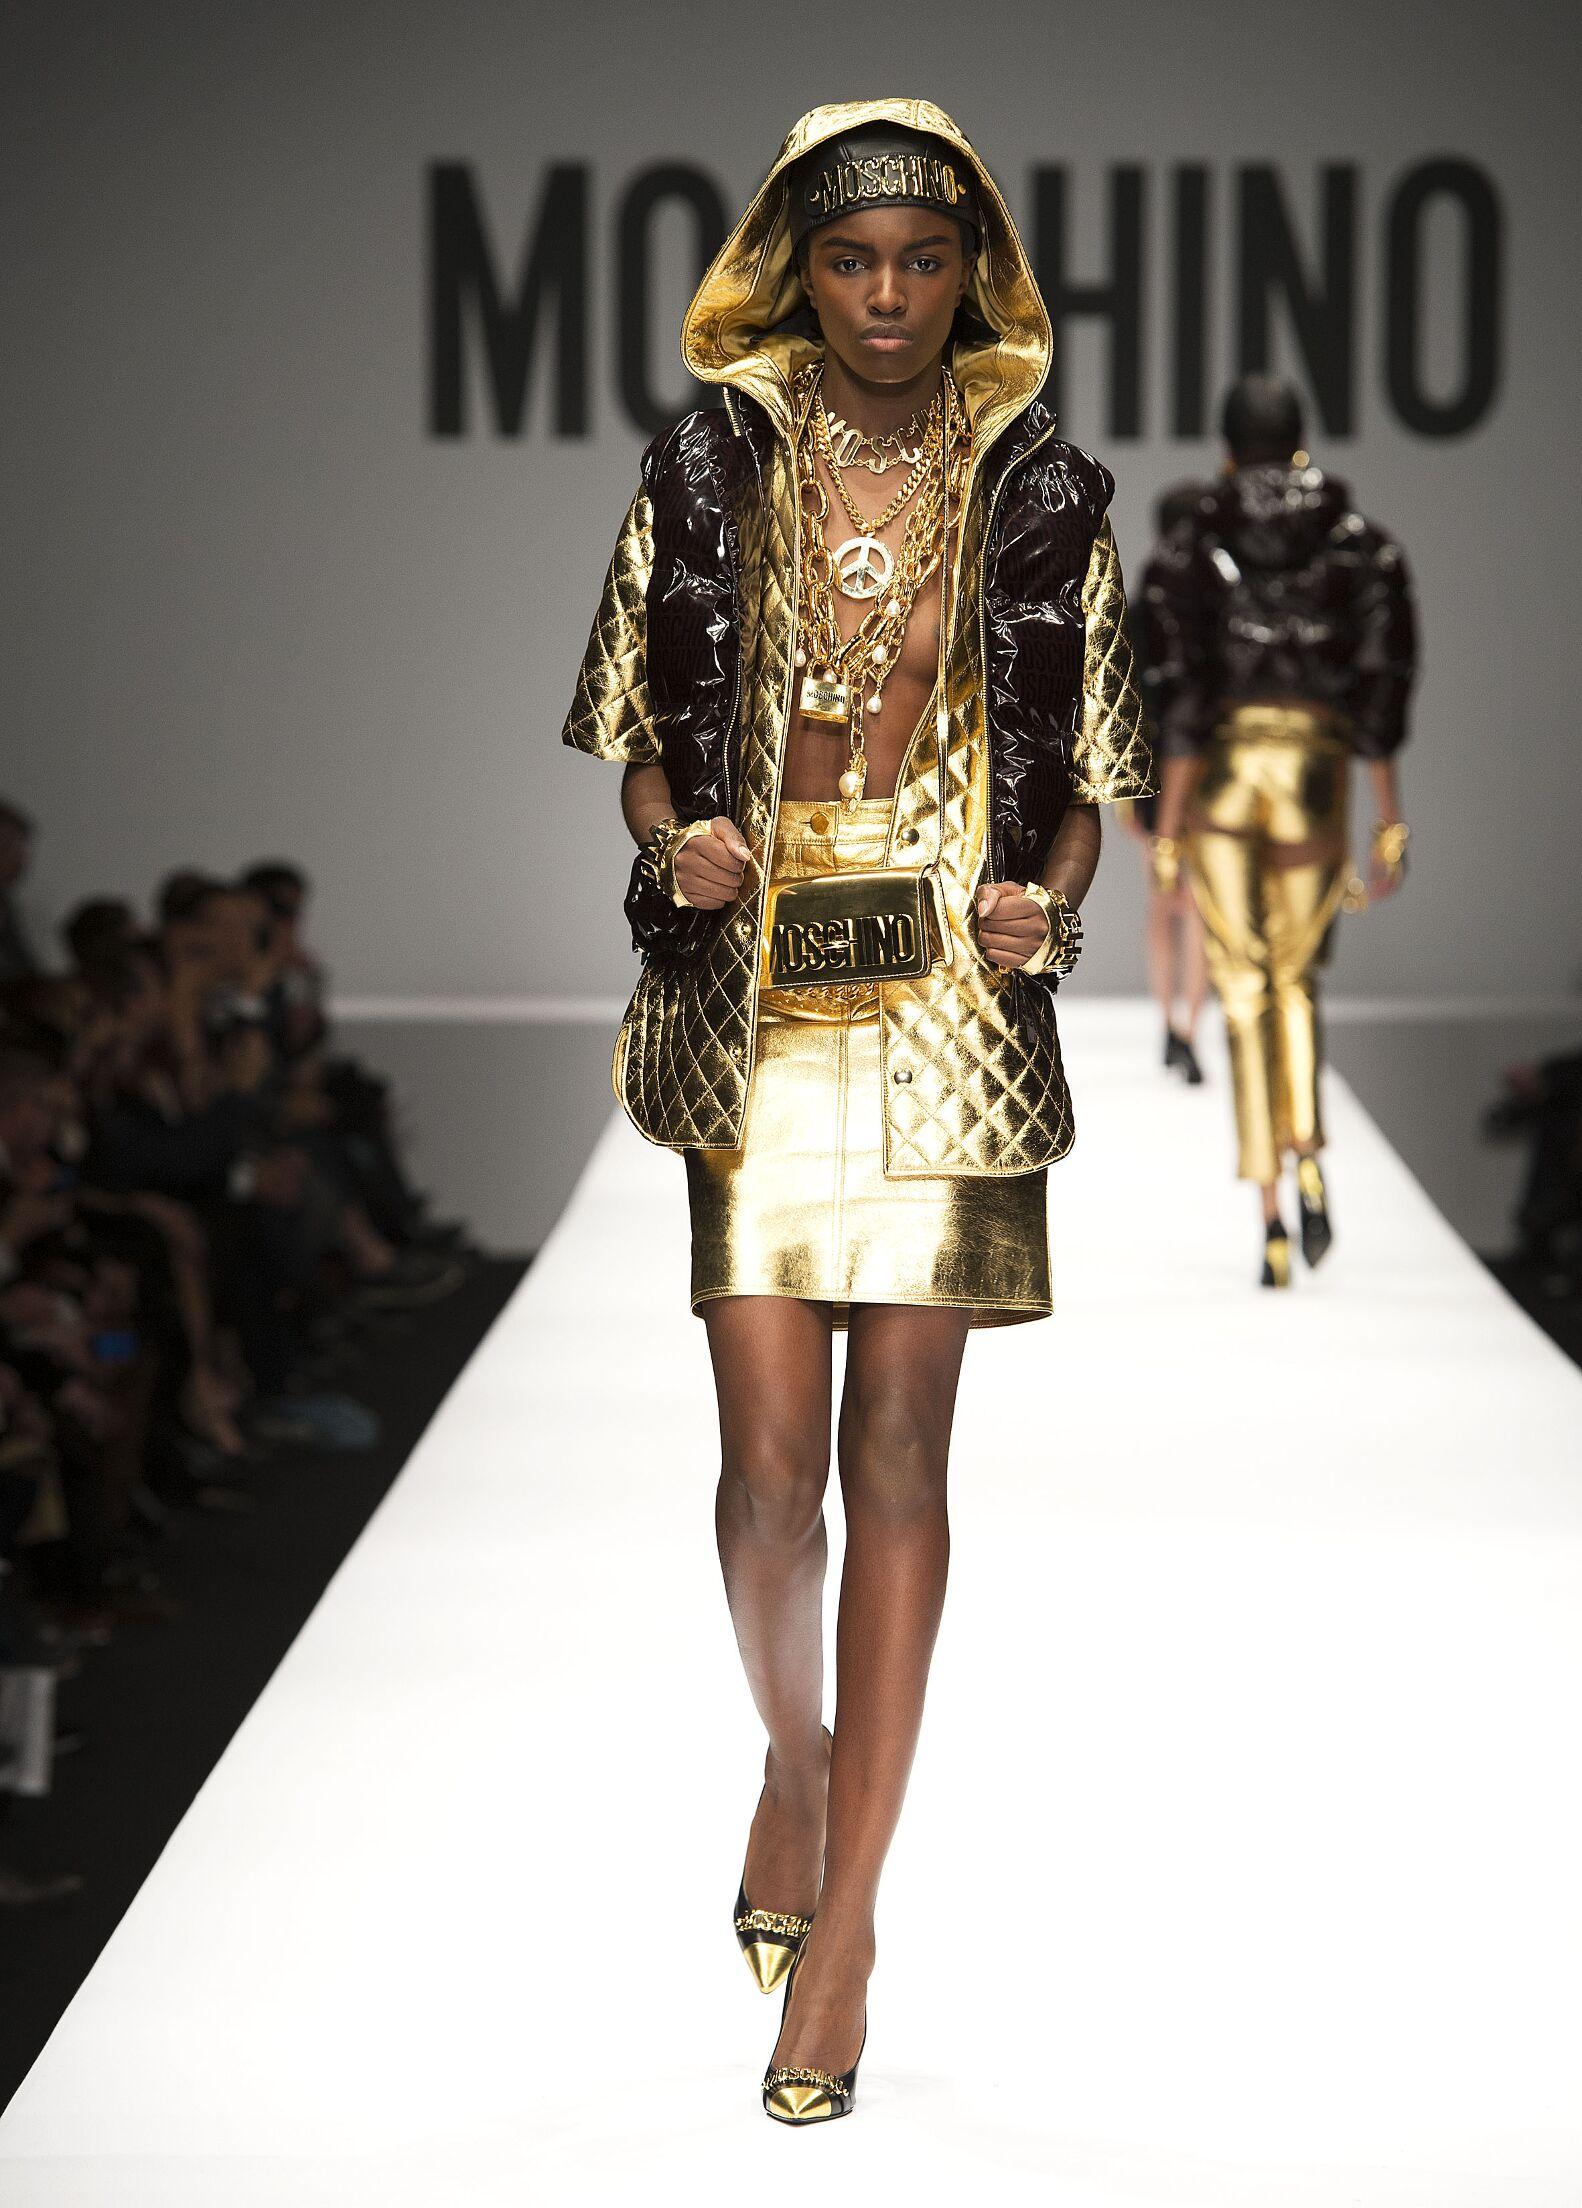 Moschino Fall 2014 Catwalk